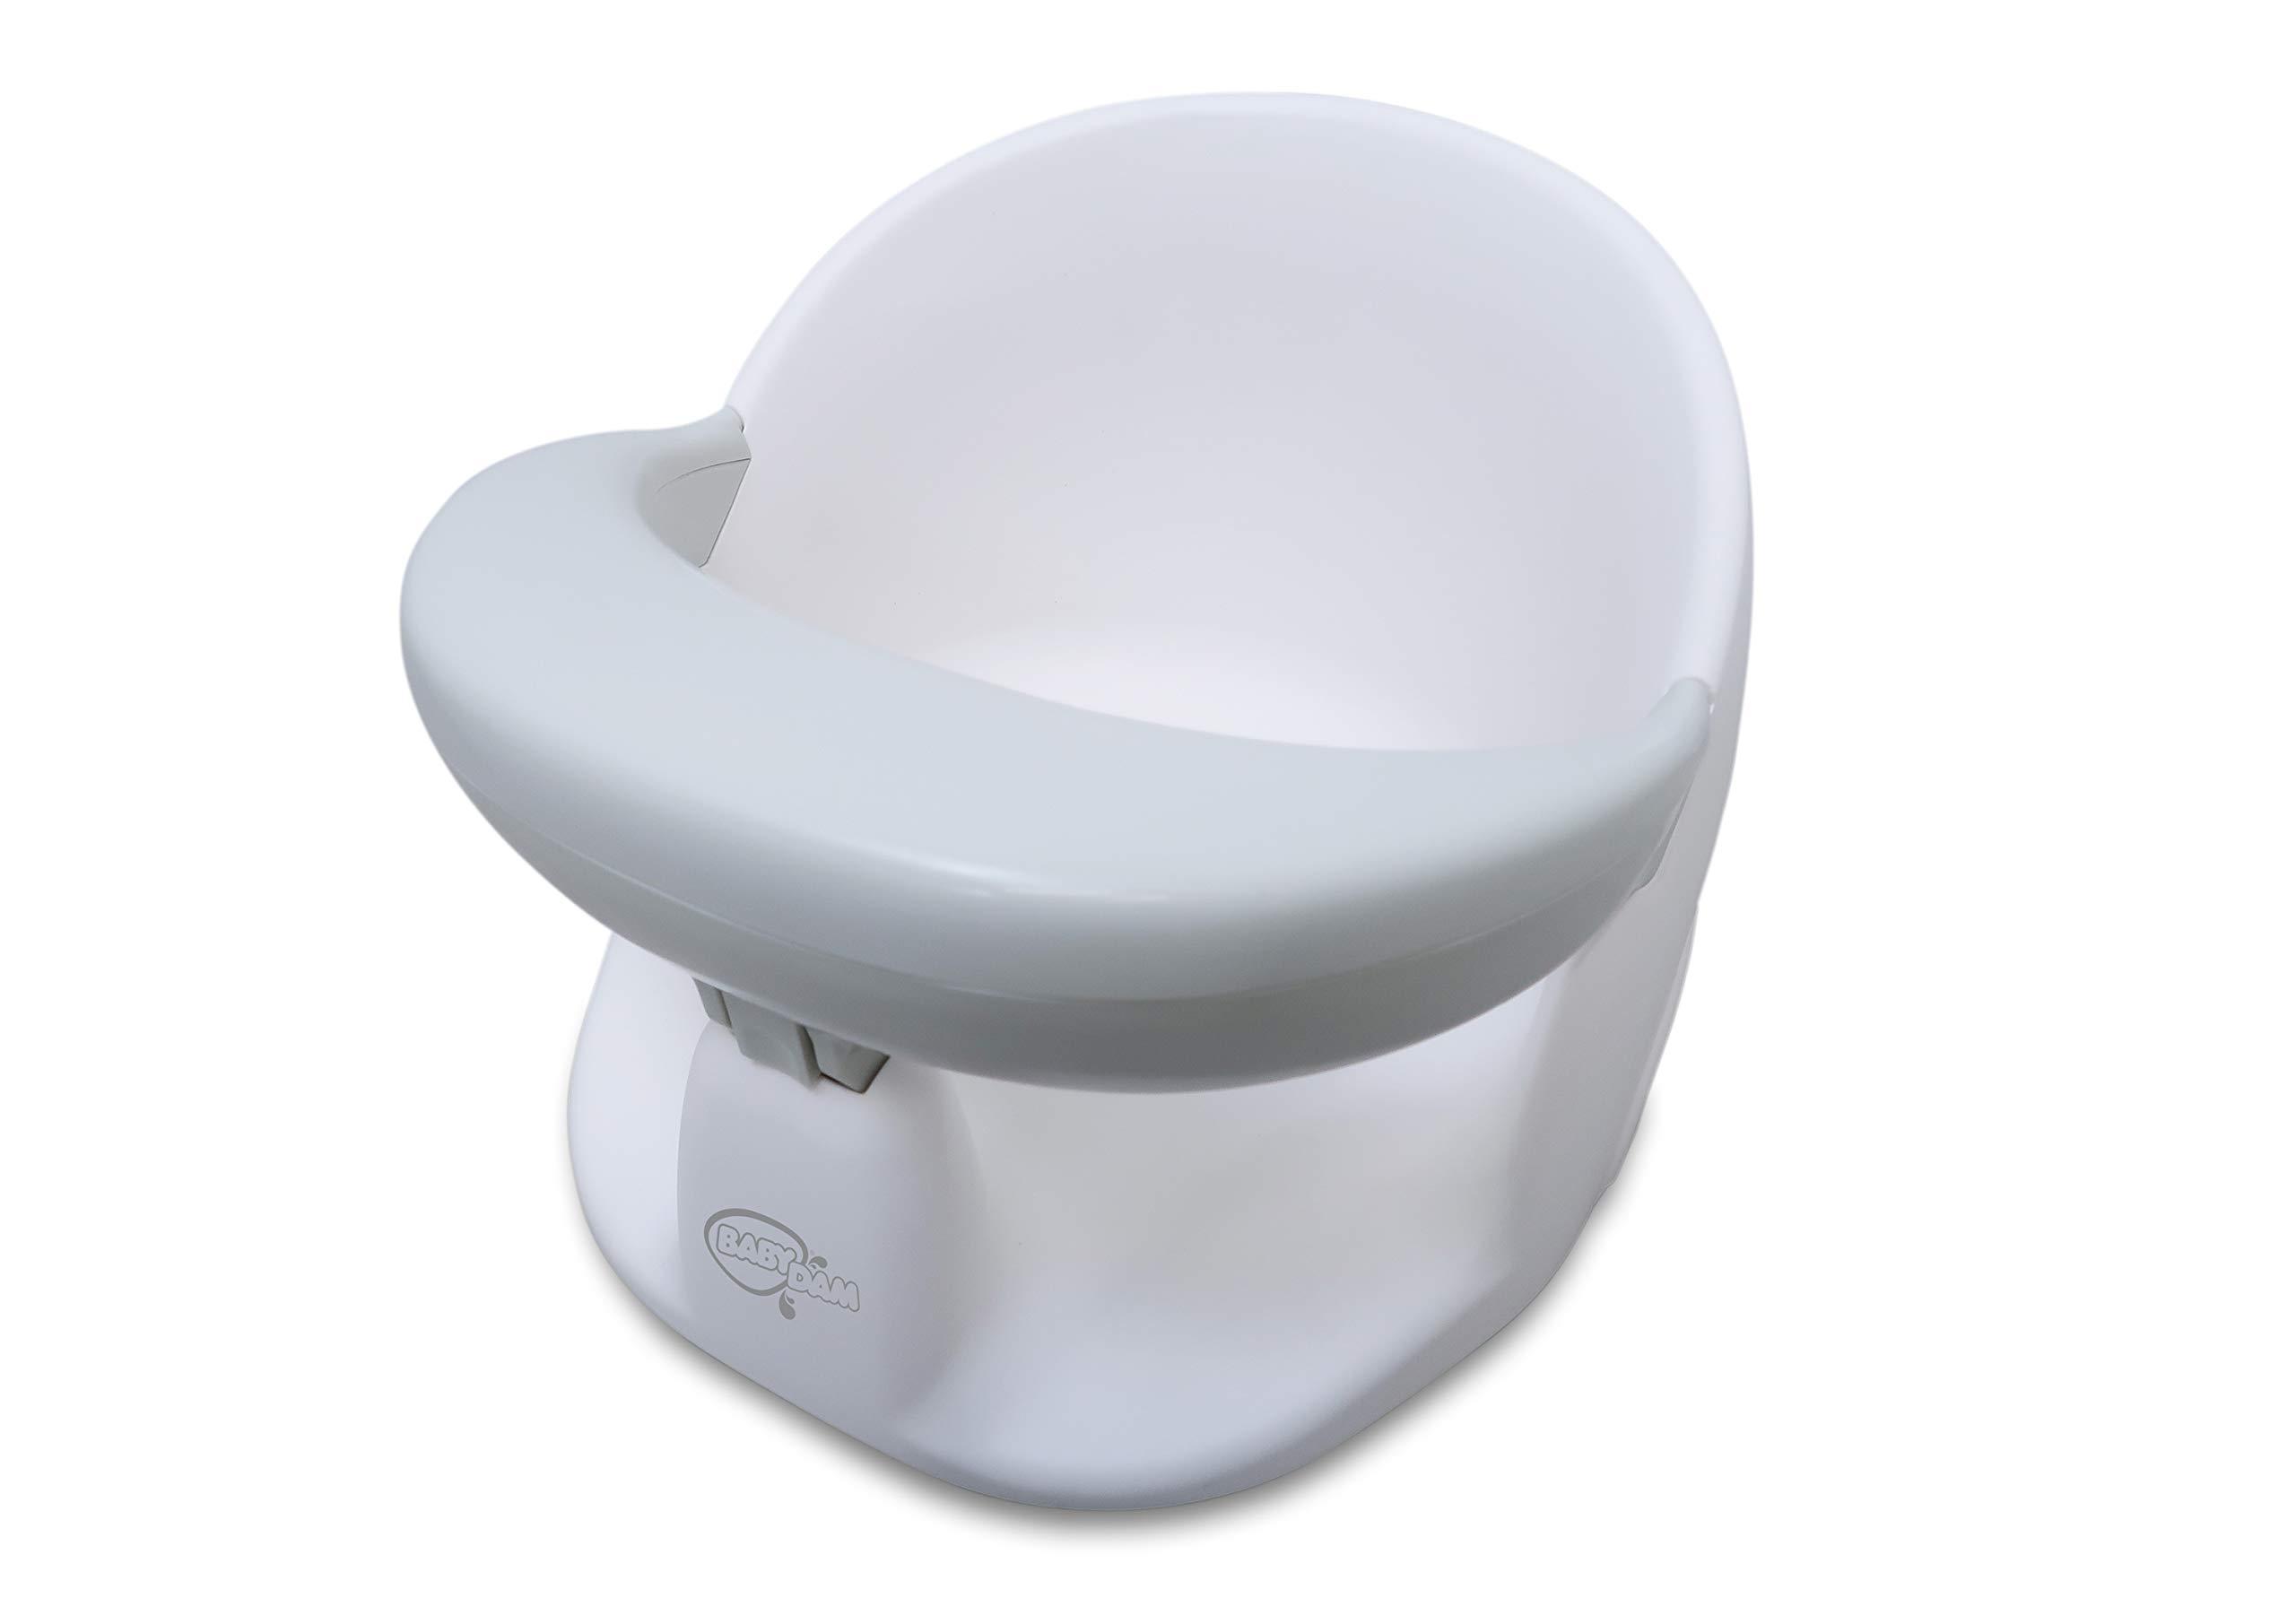 BabyDam Baby Orbital Swivel Bath Seat - White/Grey 1